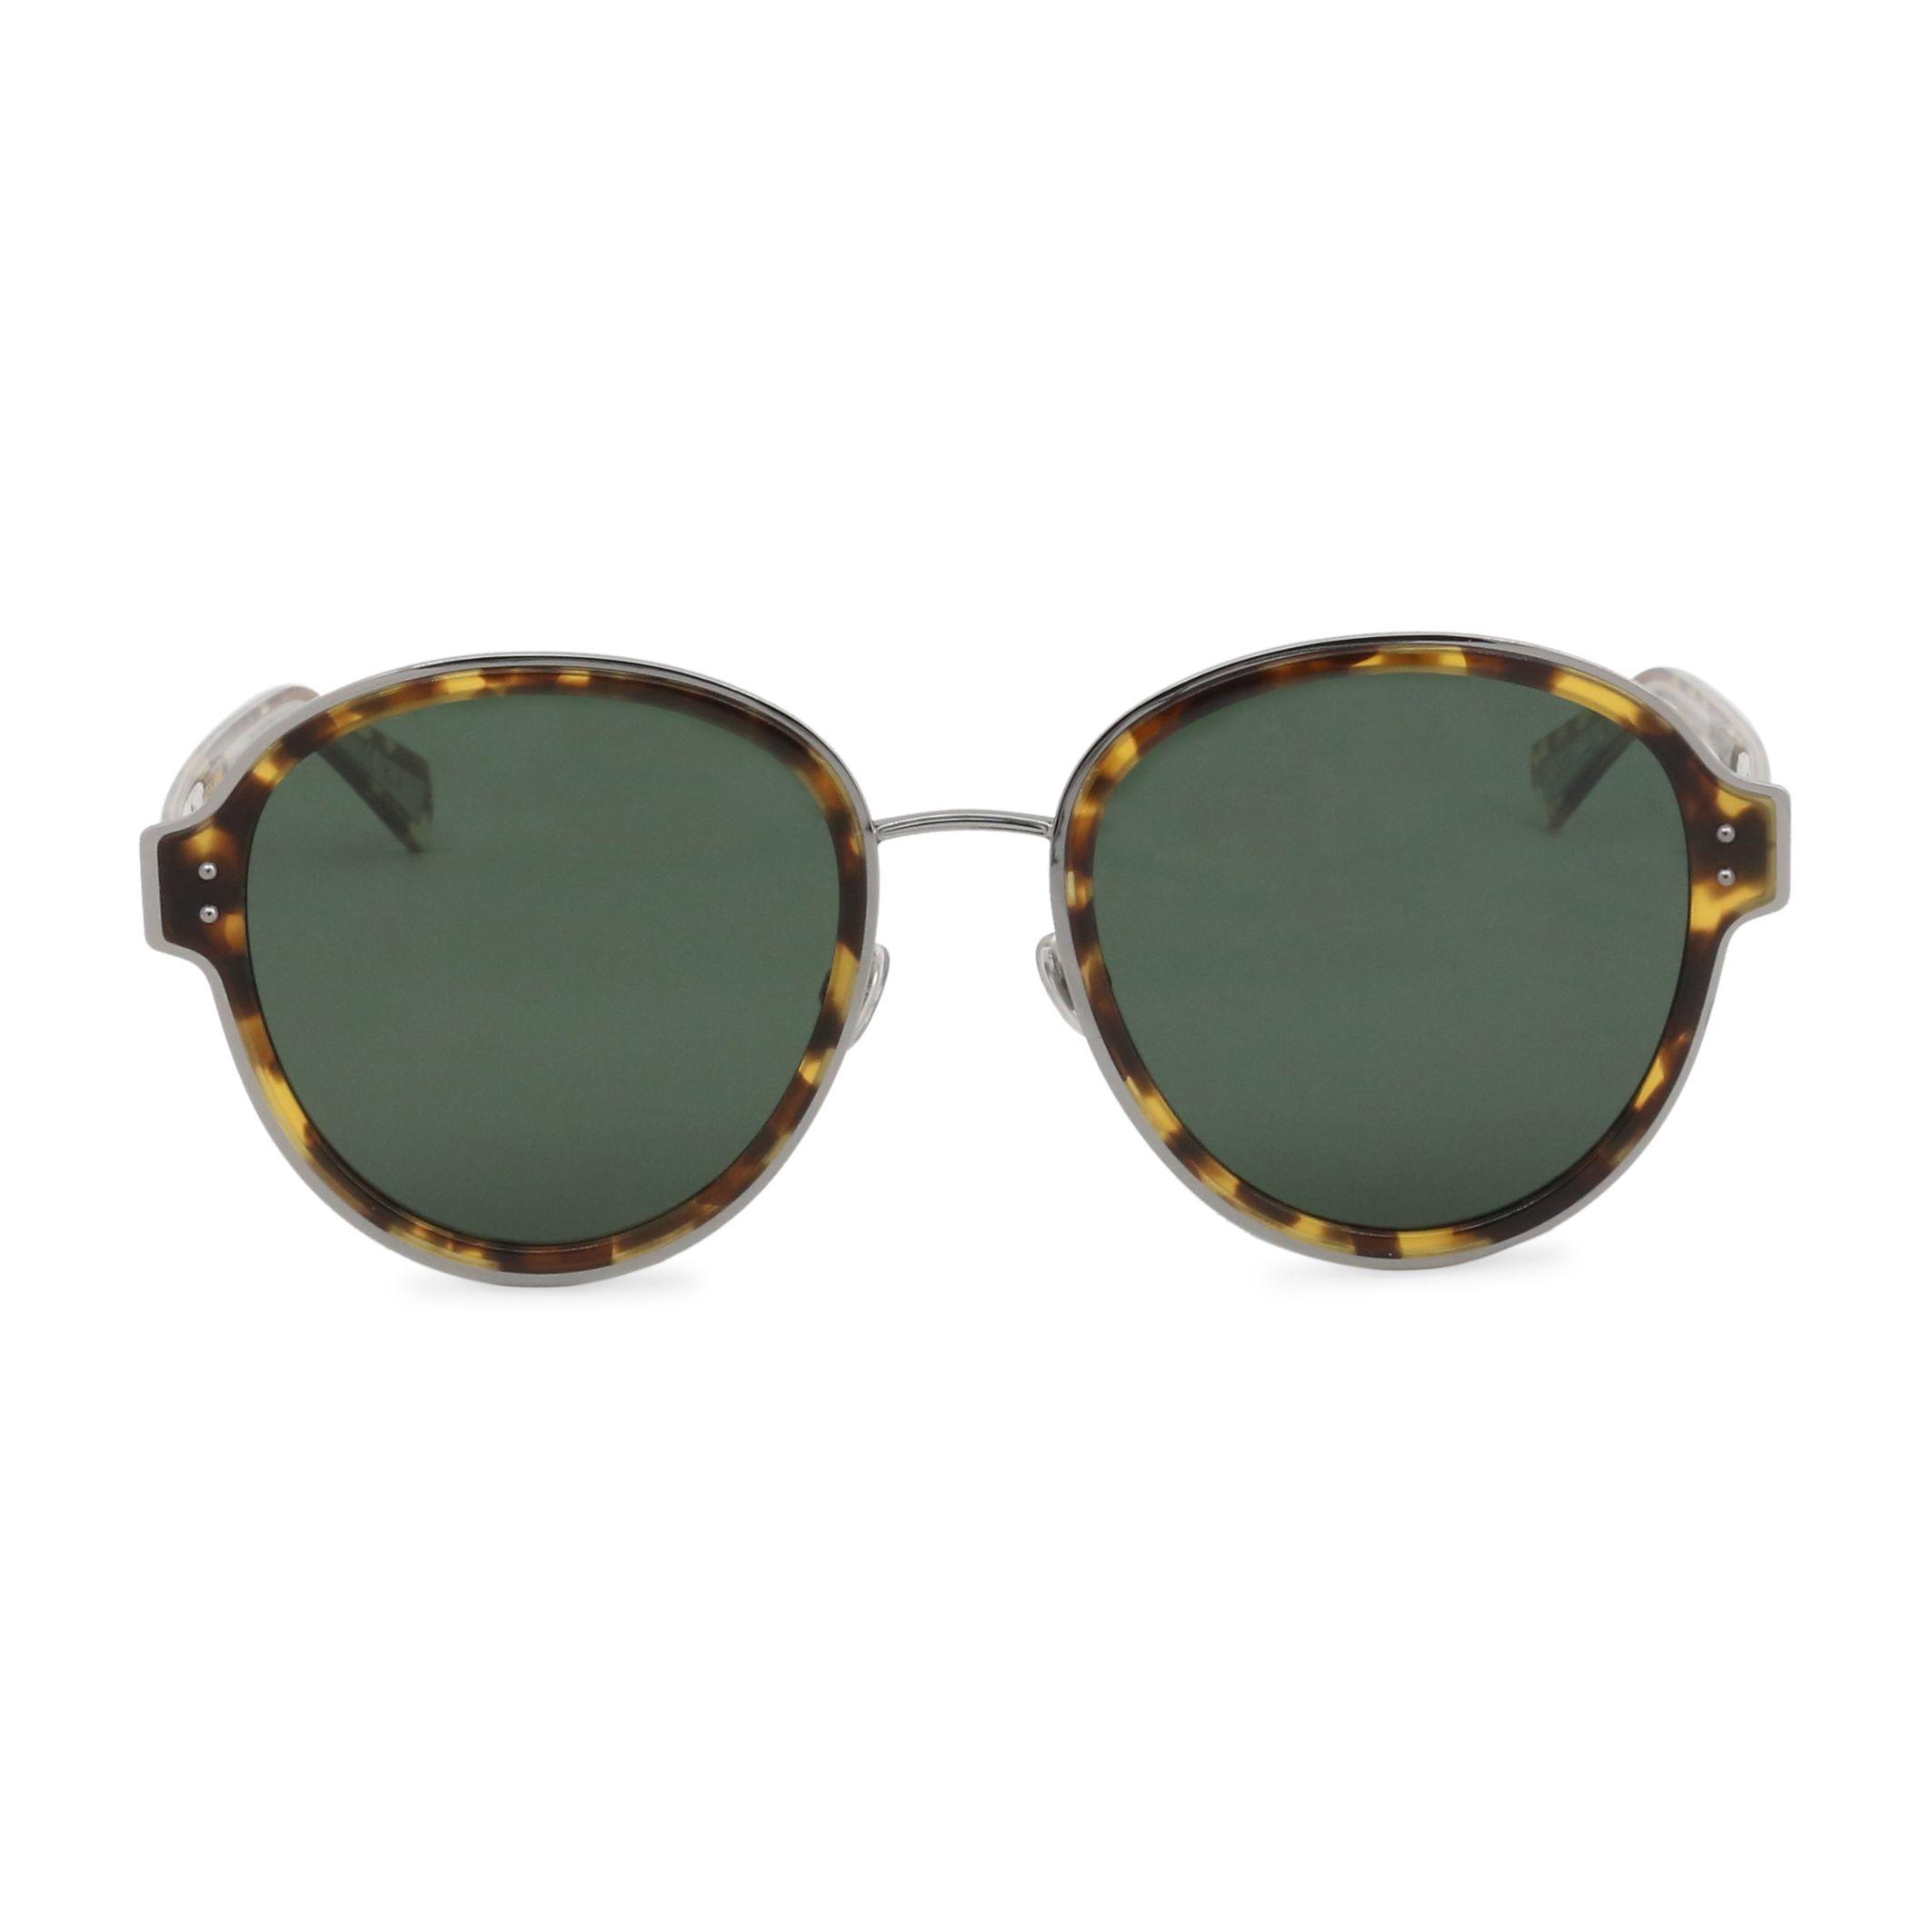 Accessoires Dior – DIORCELESTIAL – Braun